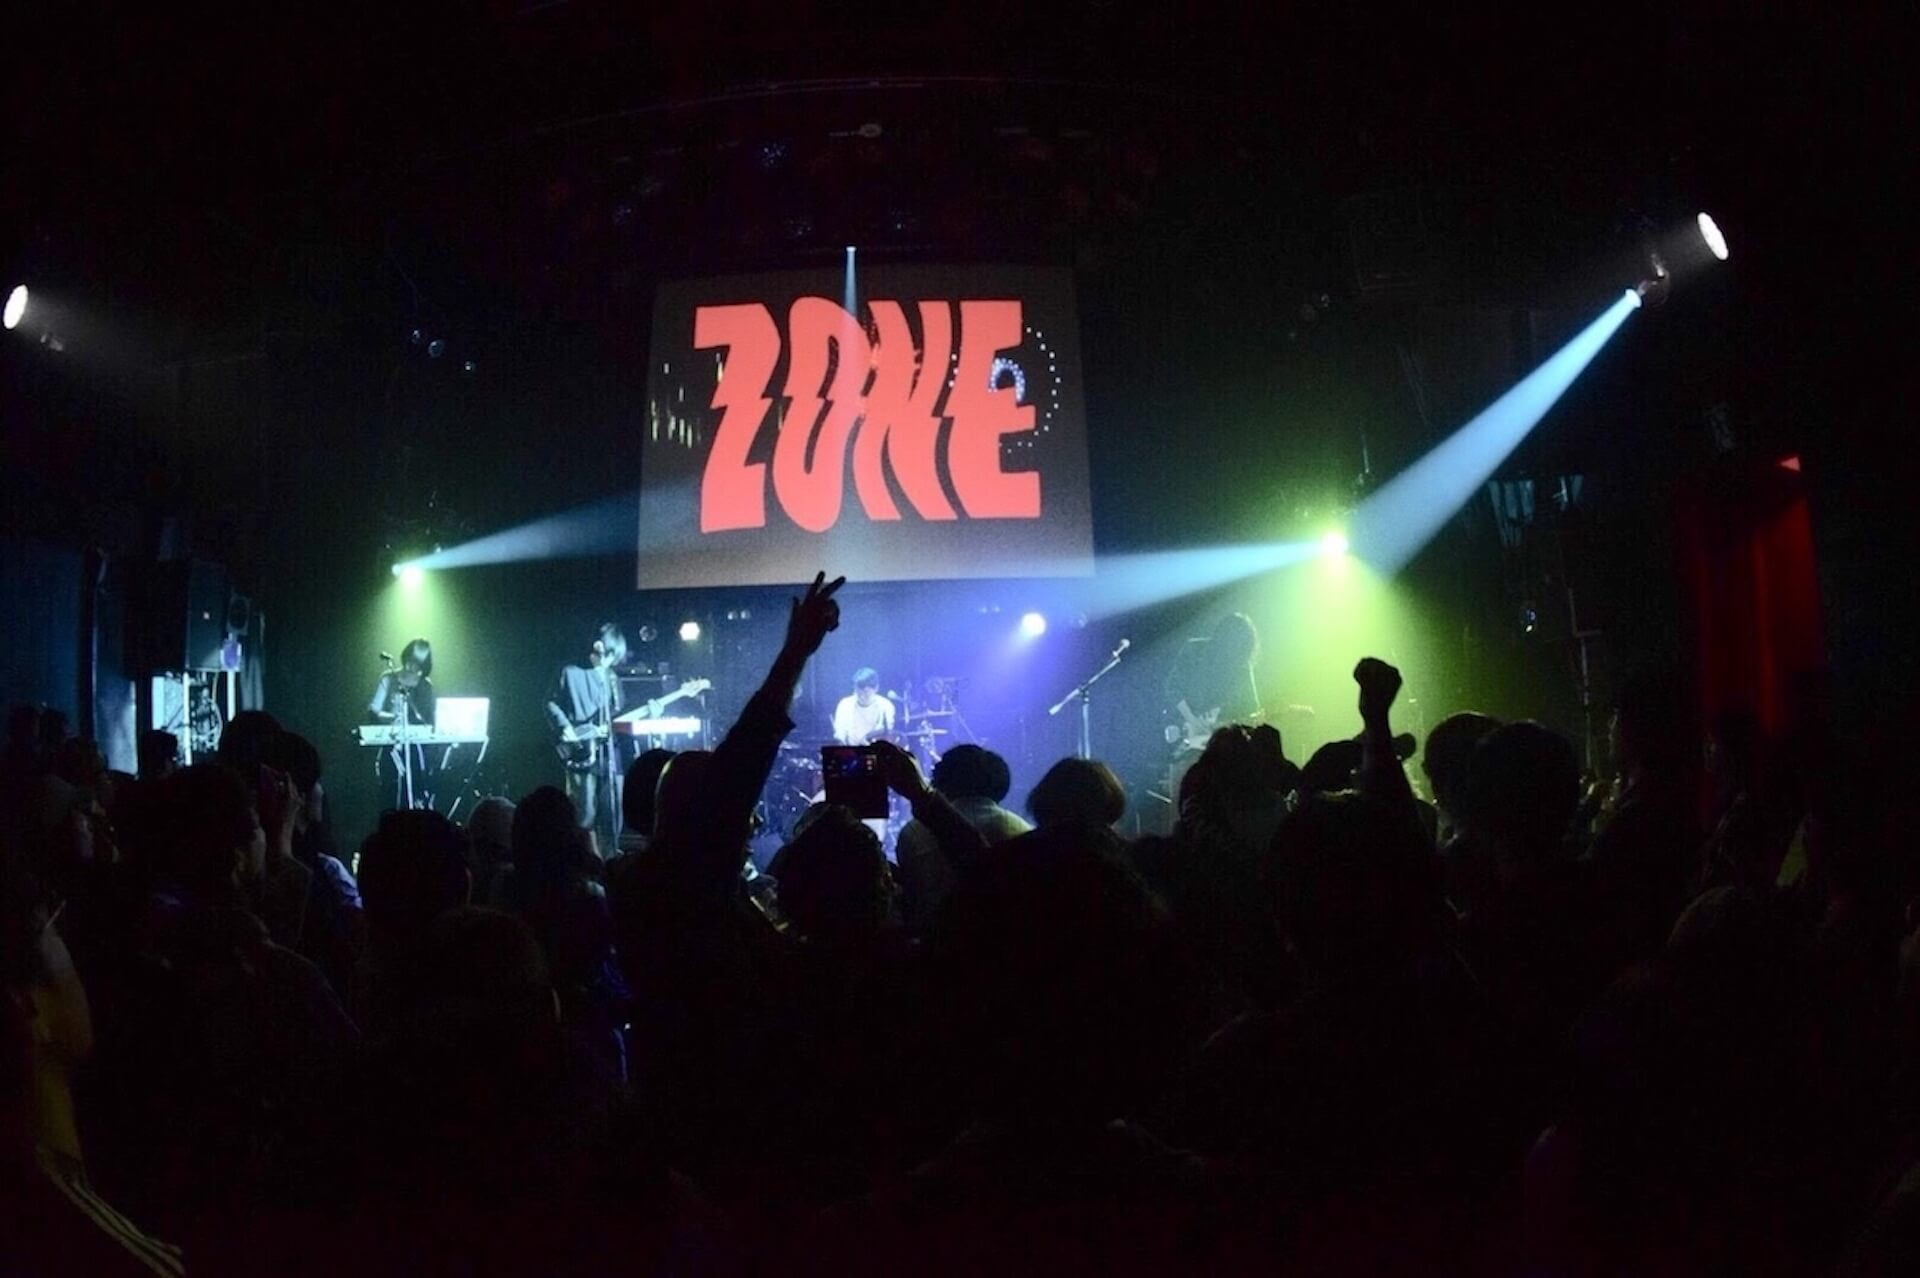 ZONE鼎談|新世代の誕生、6バンド+DJが作る新たなインディシーン interview-zone2-2